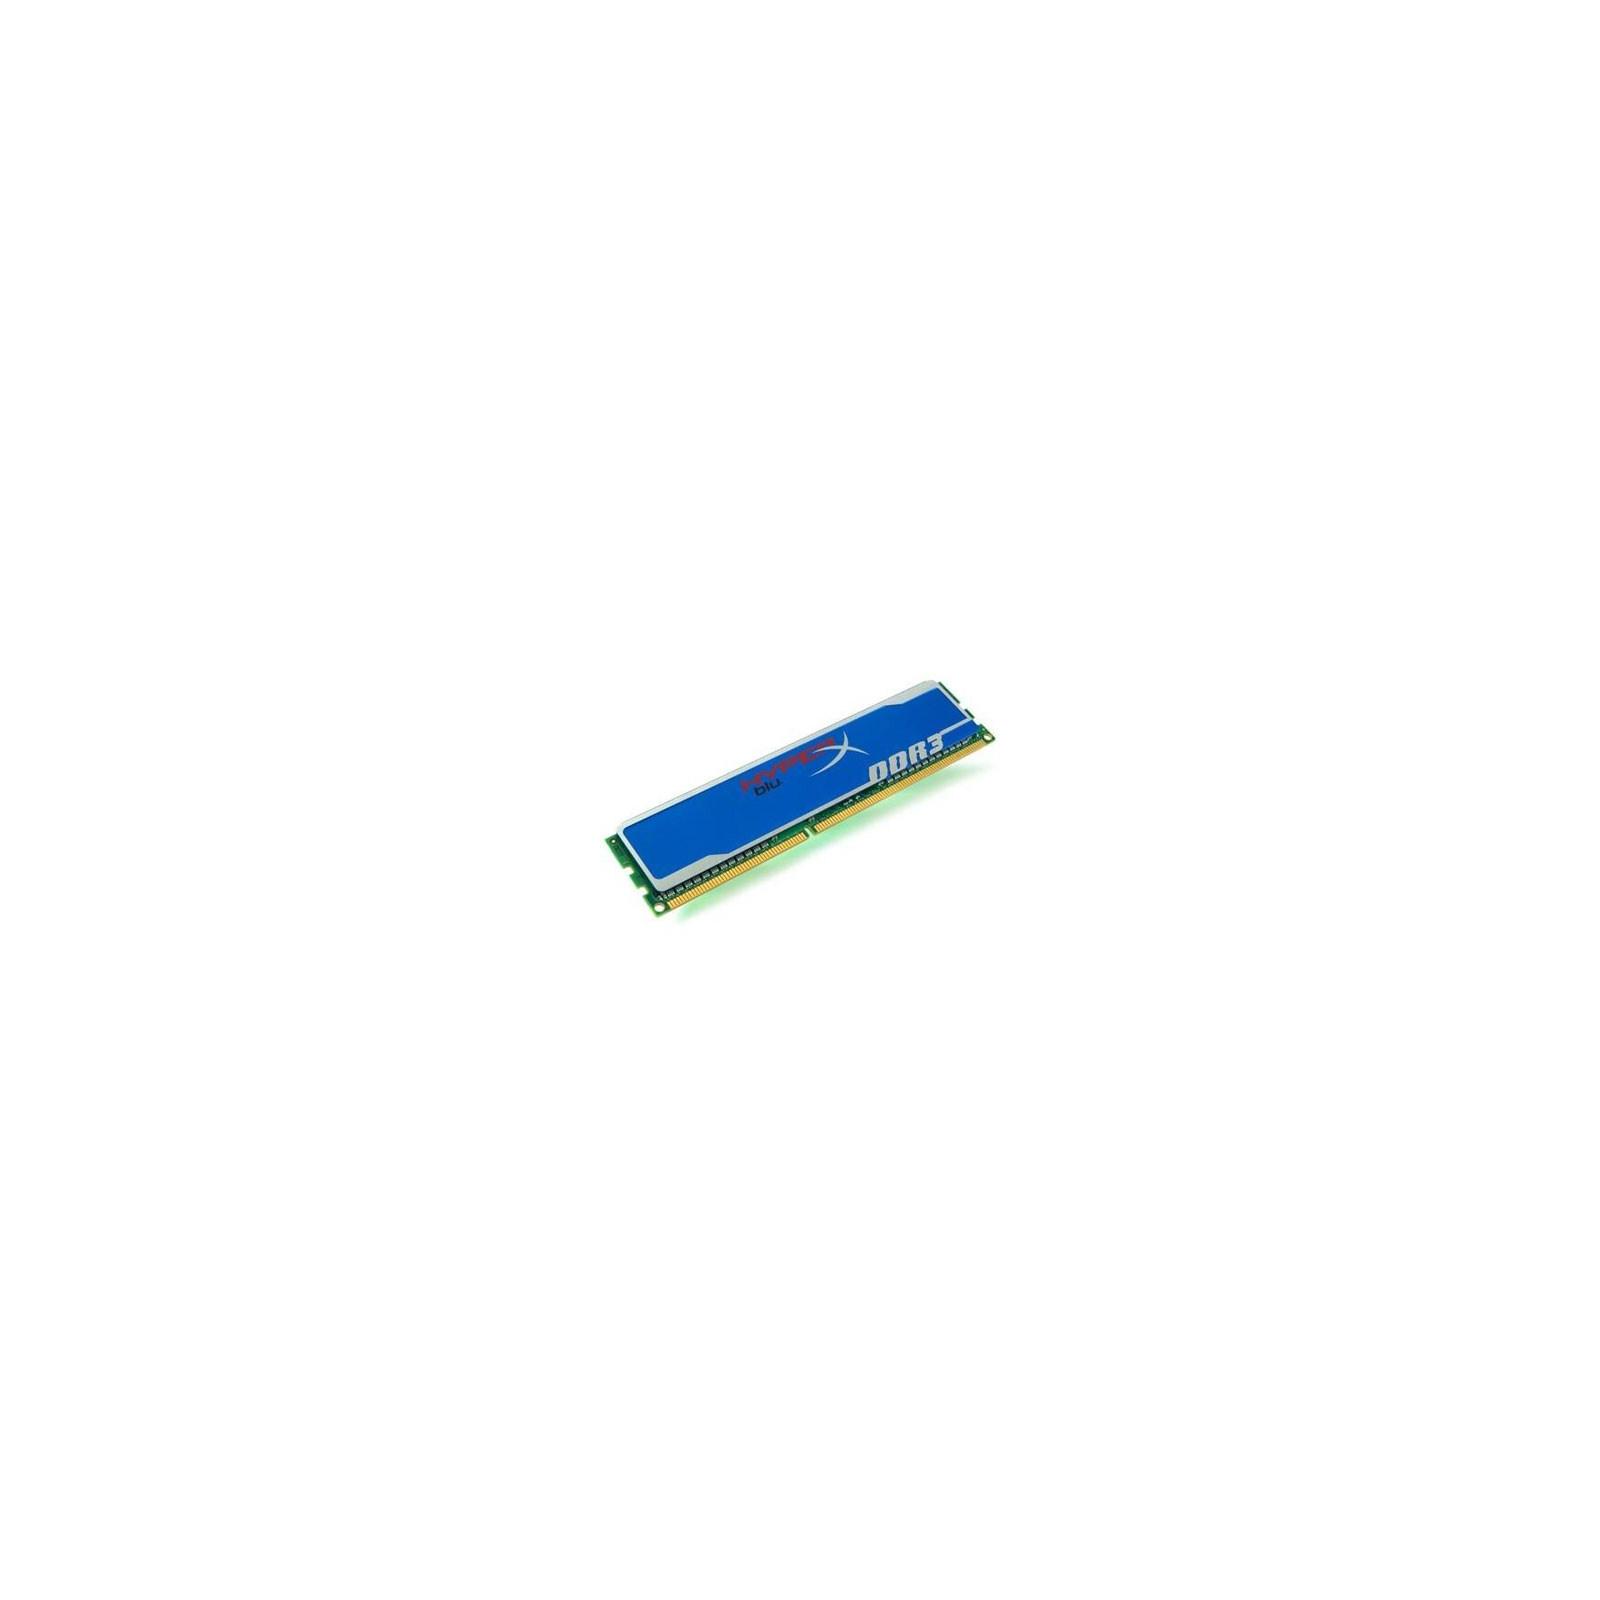 Модуль памяти для компьютера DDR3 2GB 1600 MHz Kingston (KHX1600C9AD3B1/2G)